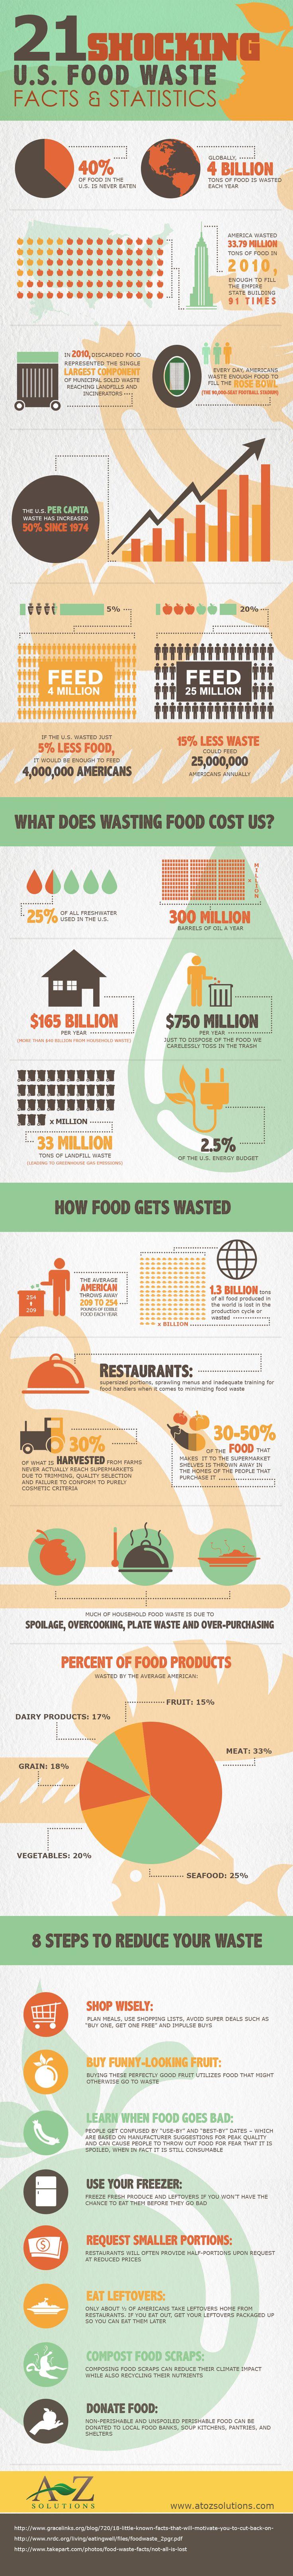 21 Shocking U.S. Food Waste Facts & Statistics - Infographic